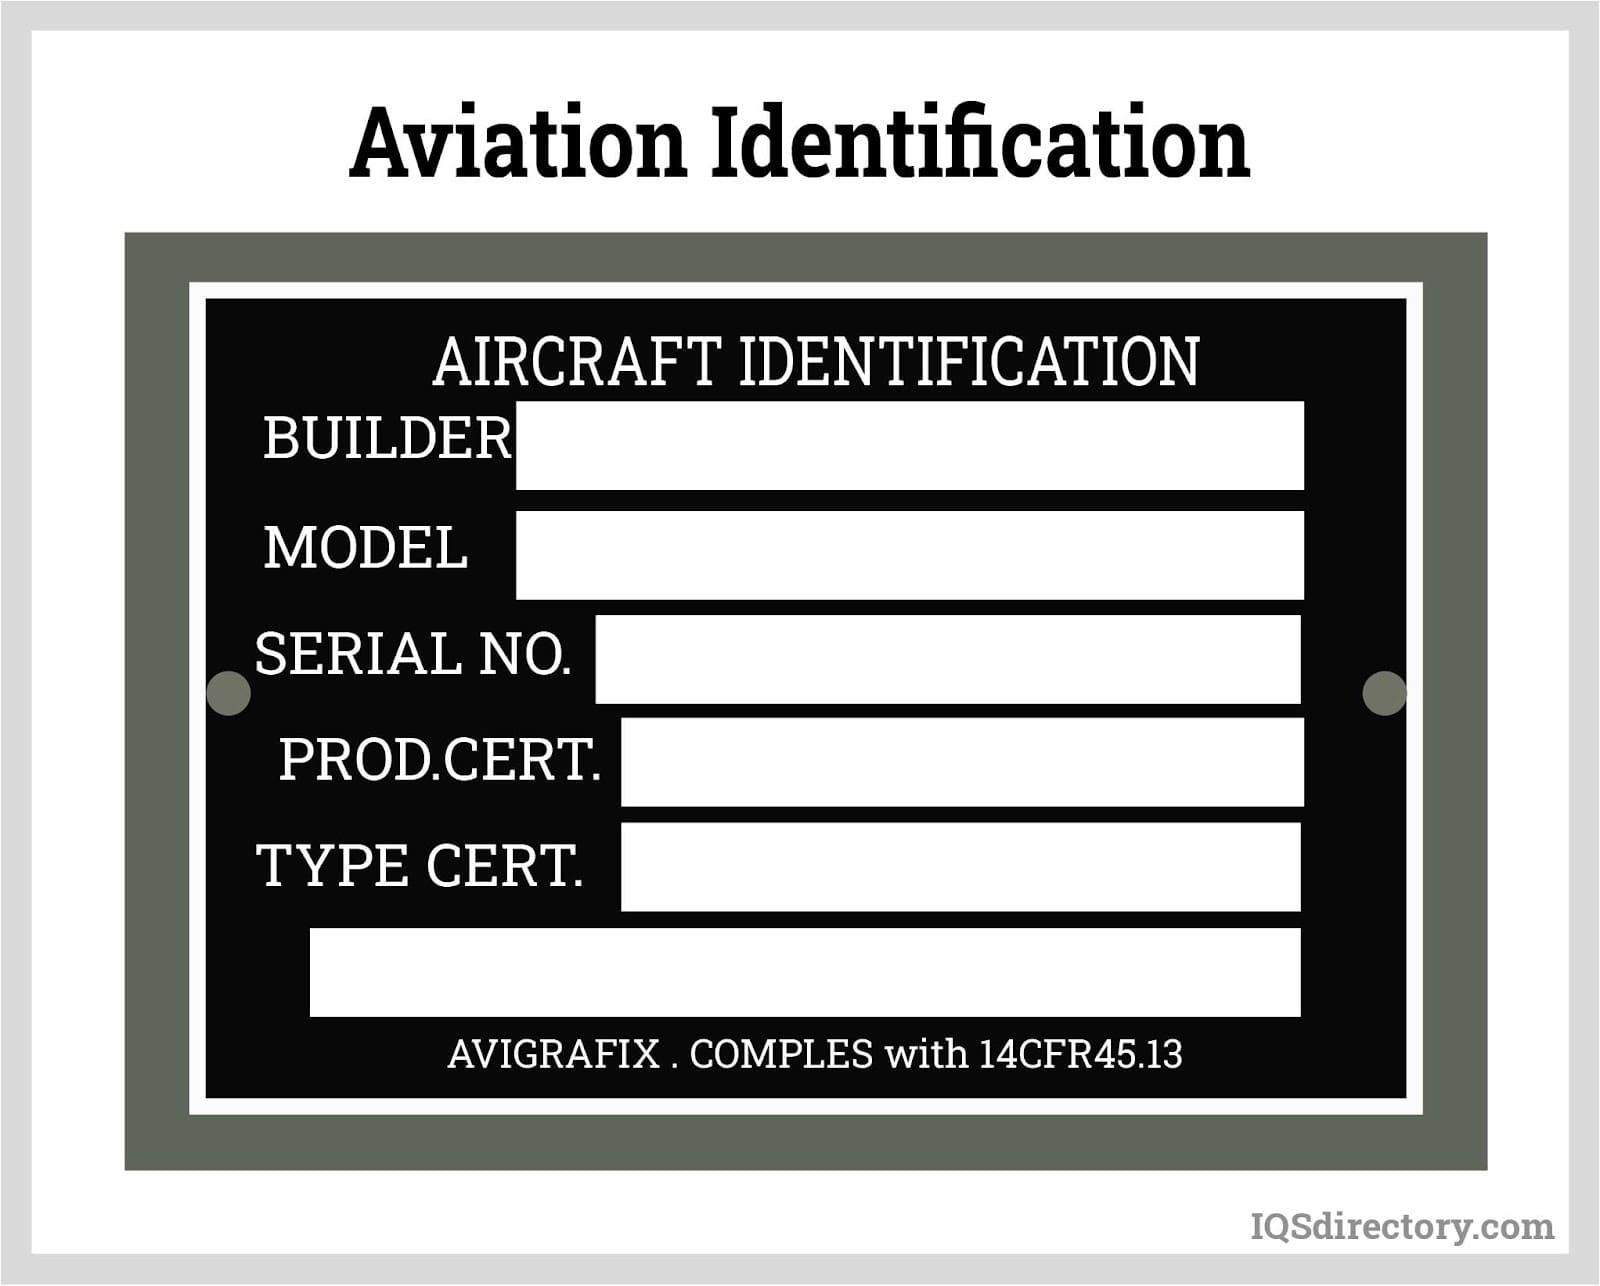 Aviation Identification